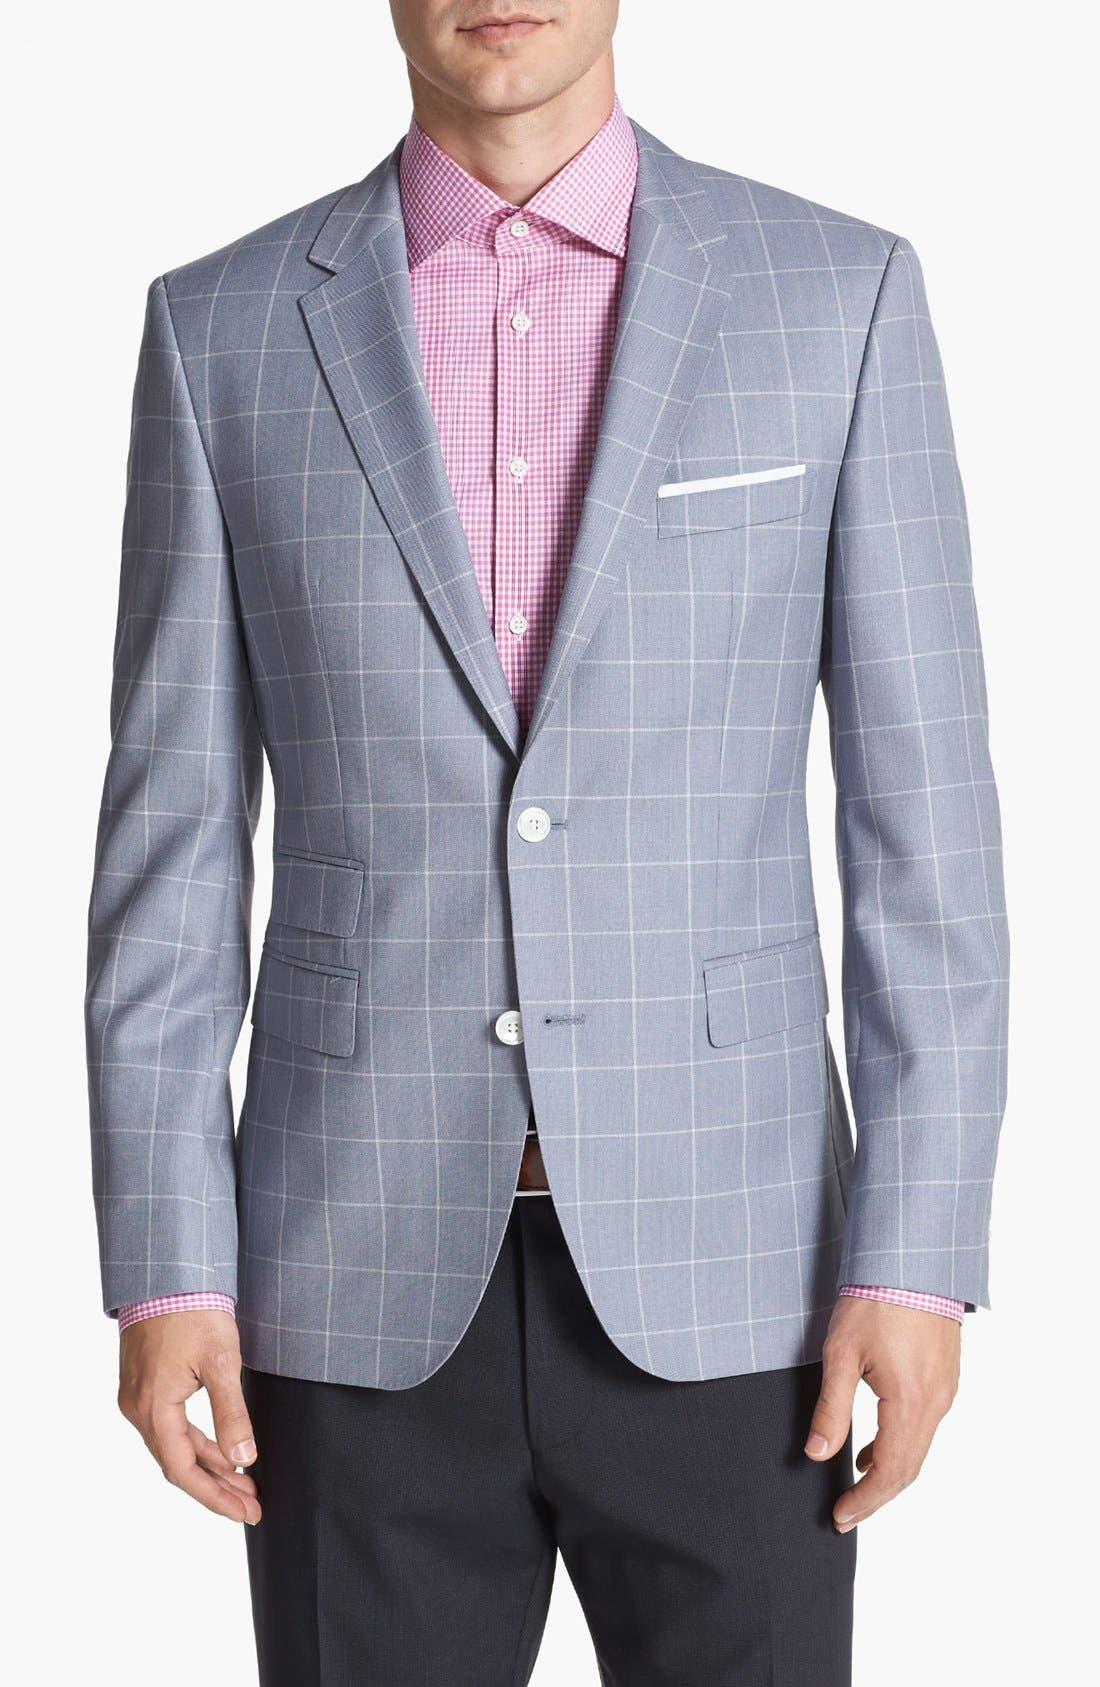 Alternate Image 1 Selected - BOSS HUGO BOSS 'Sweet' Trim Fit Plaid Sportcoat